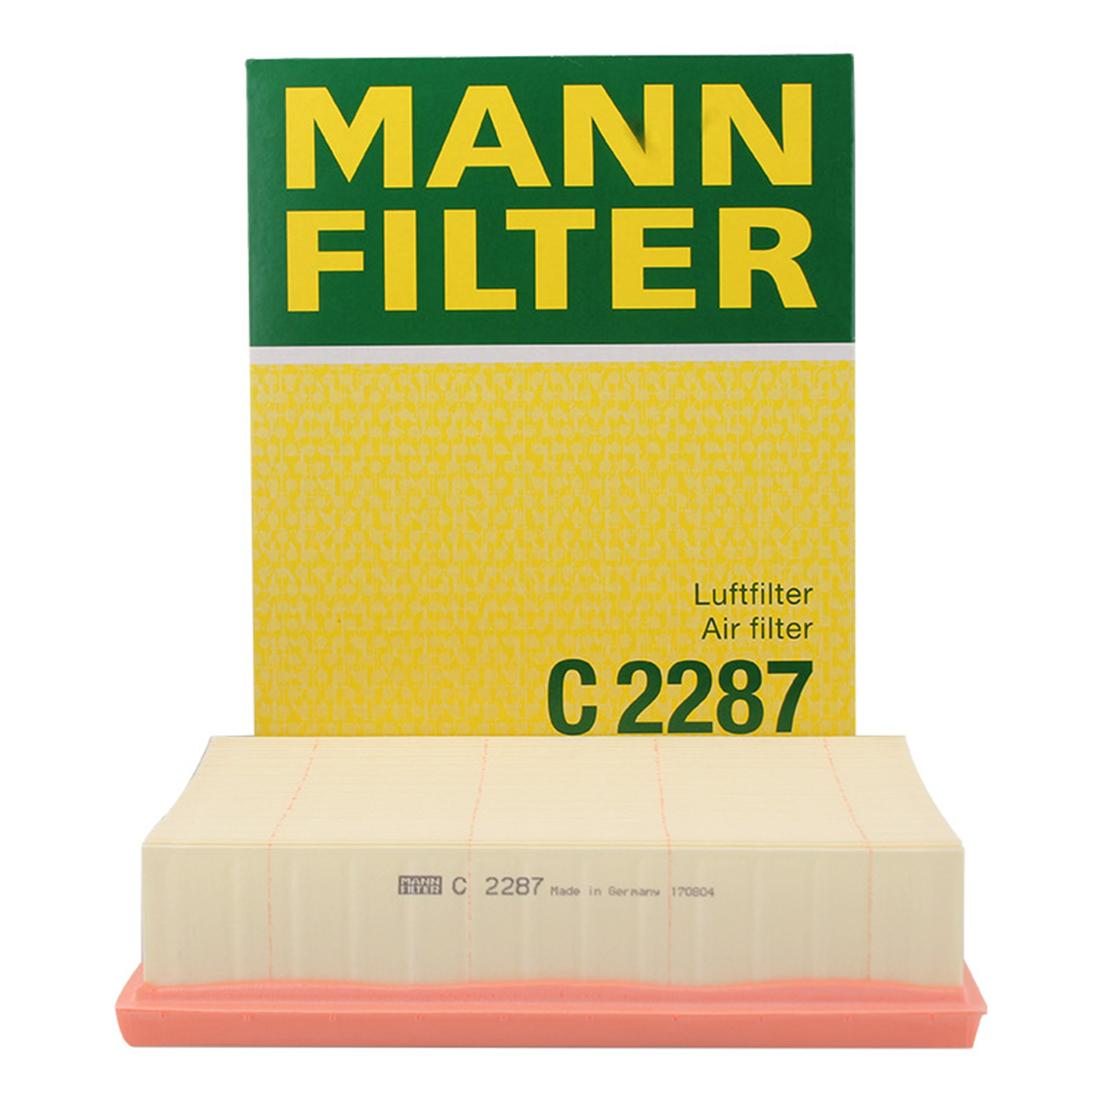 Engine-Air Filter for Mercedes-Benz W169 W245 A160 A180 A200 B200 OE 2660940004